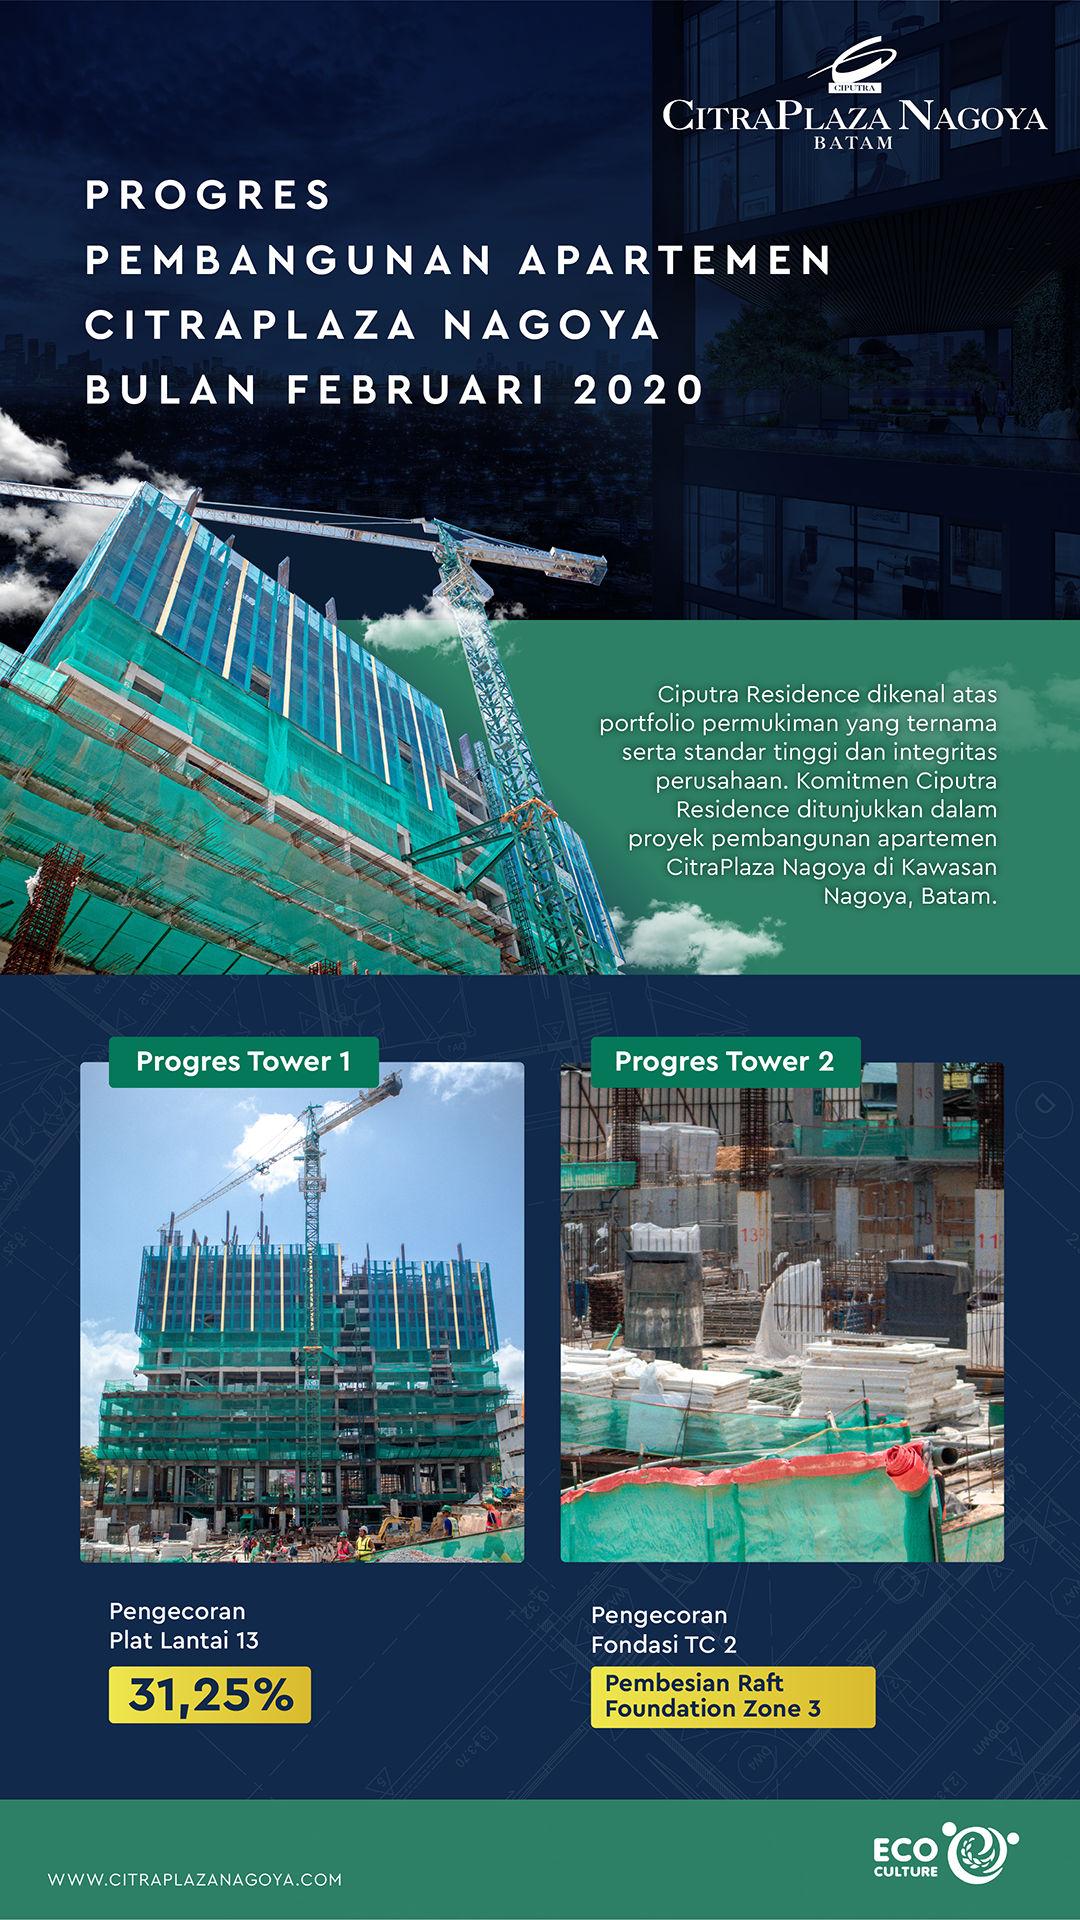 Progres Pembangunan Apartemen CitraPlaza Nagoya Bulan Februari 2020 (Infografik) - CitraPlaza Nagoya